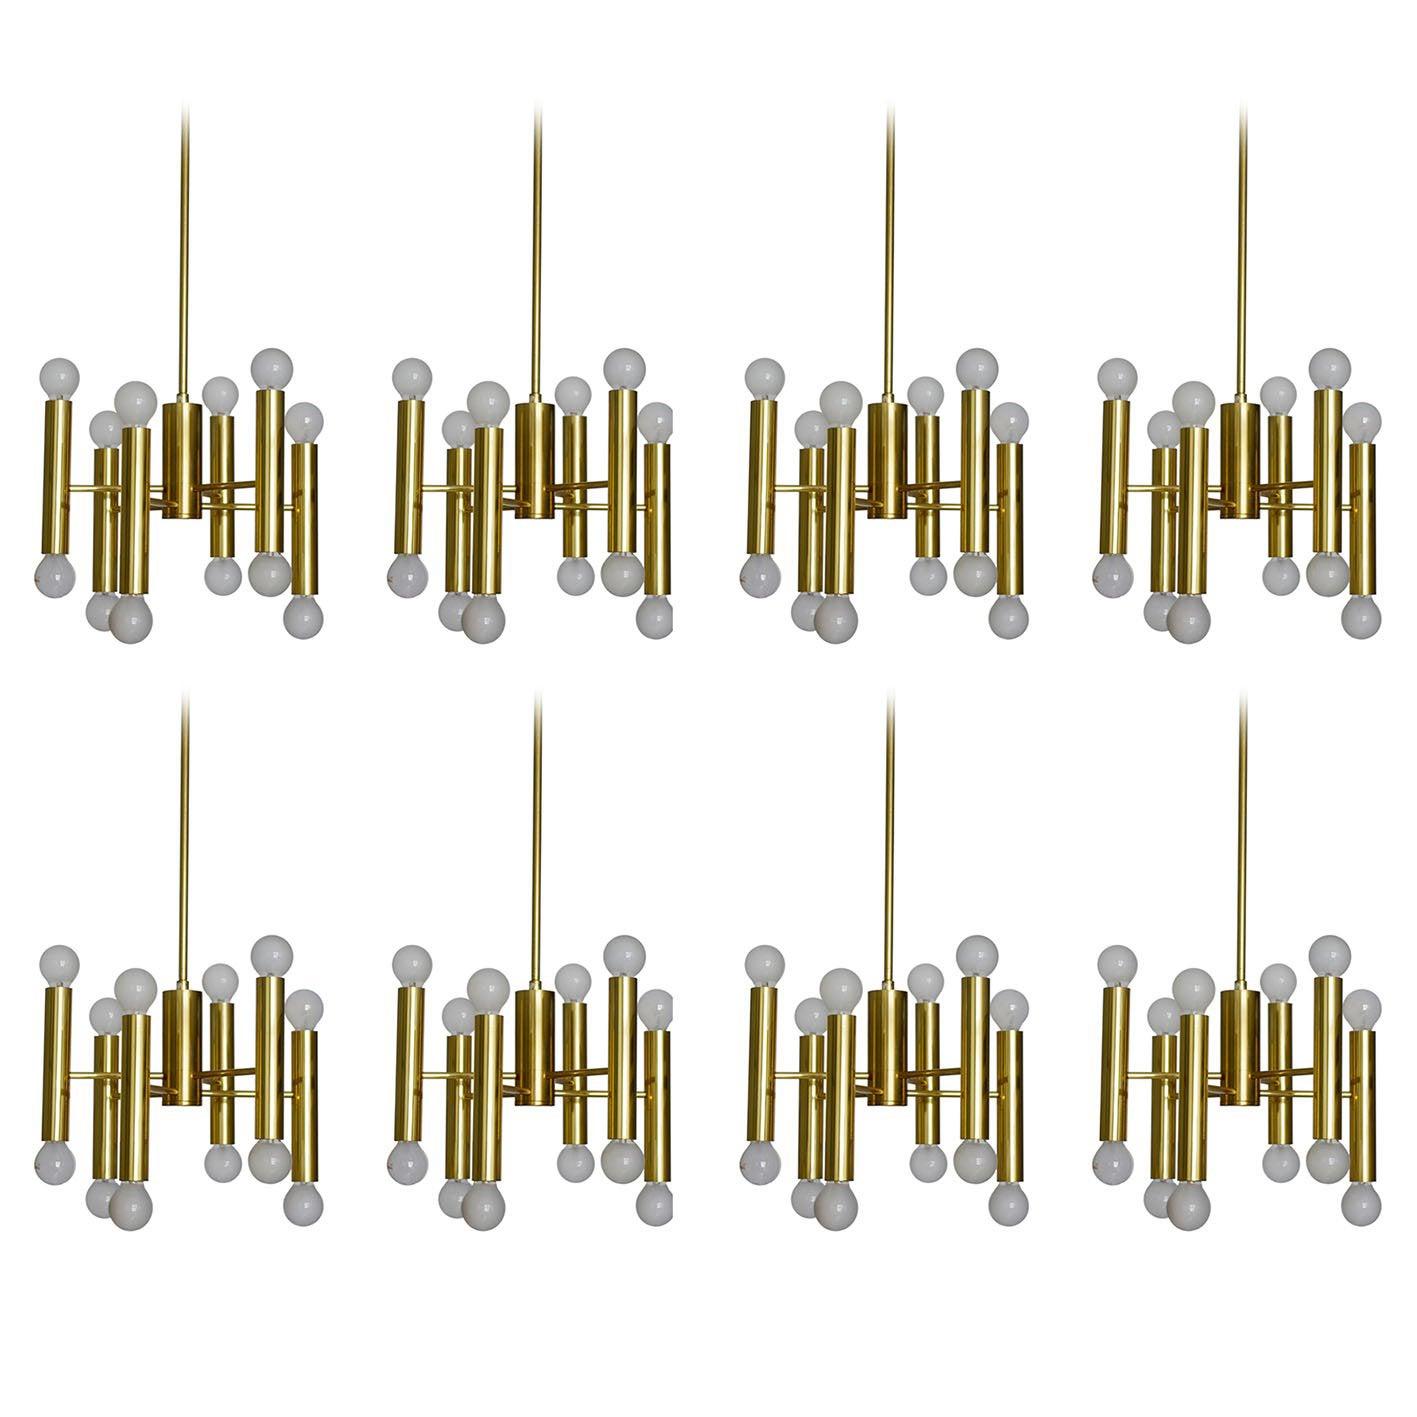 Eight Modernist Sciolari Tube Chandeliers Ceiling Lights Pendants, Italy, 1960s